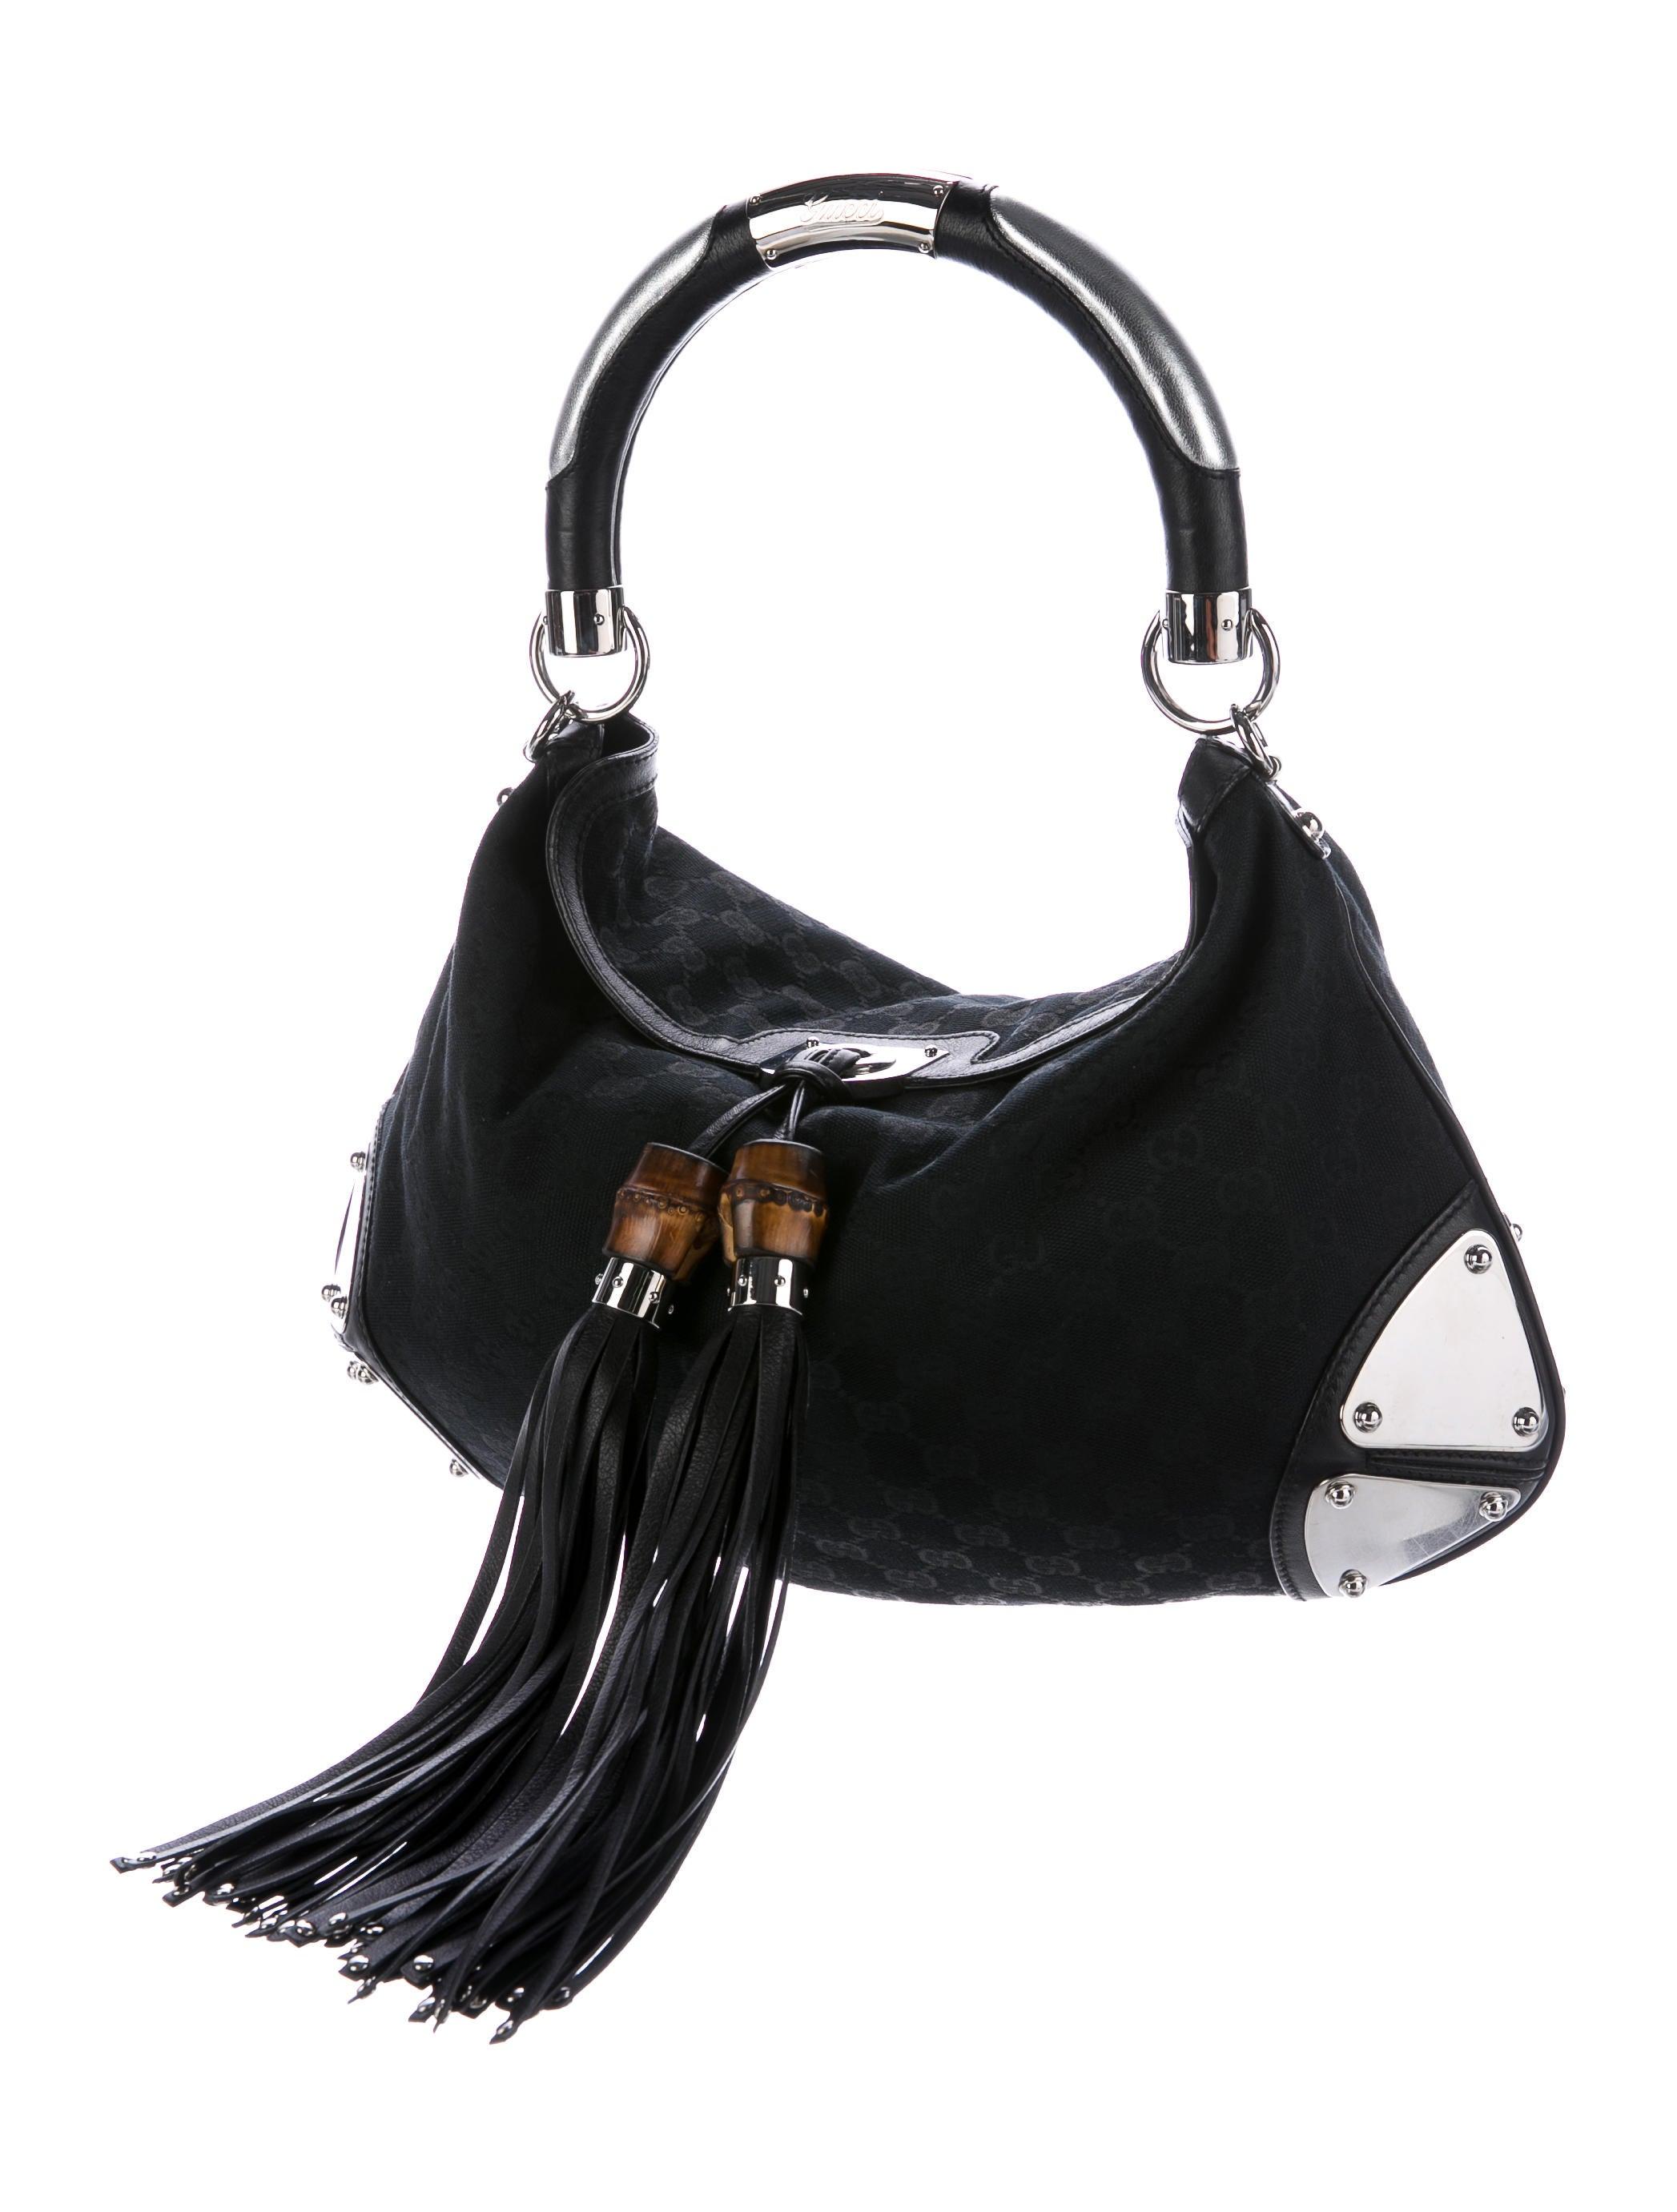 0cc9118d0dd677 Gucci Medium GG Canvas Babouska Indy - Handbags .